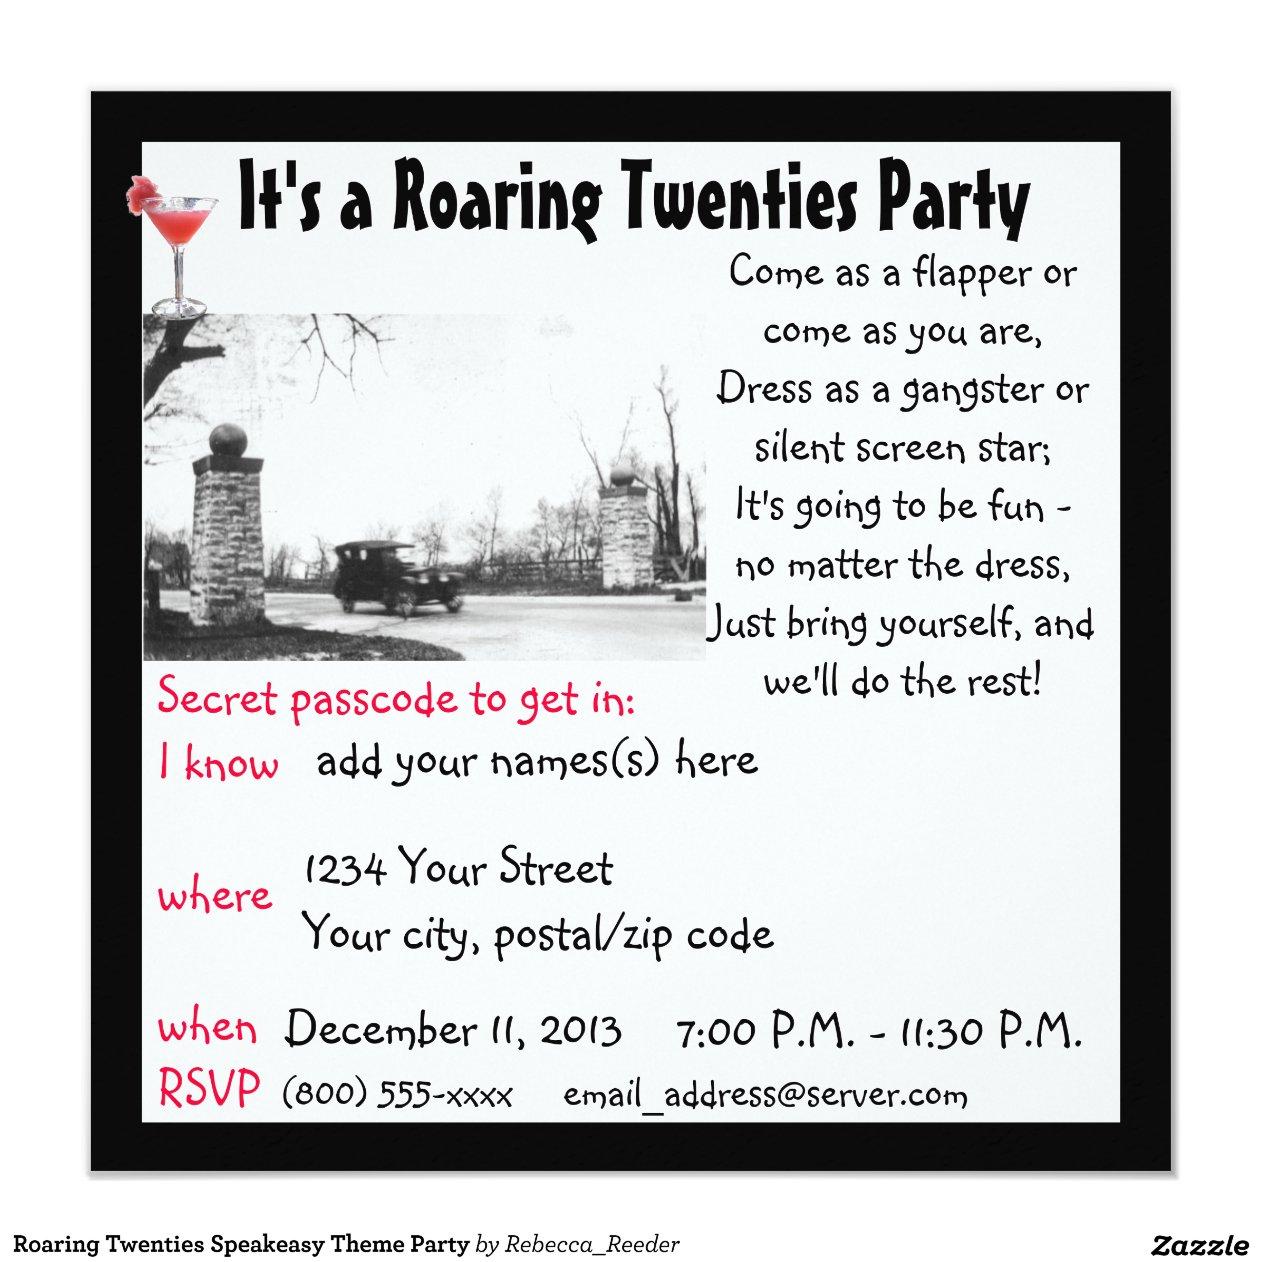 Speakeasy Party Invitation Wording | southernsoulblog.com